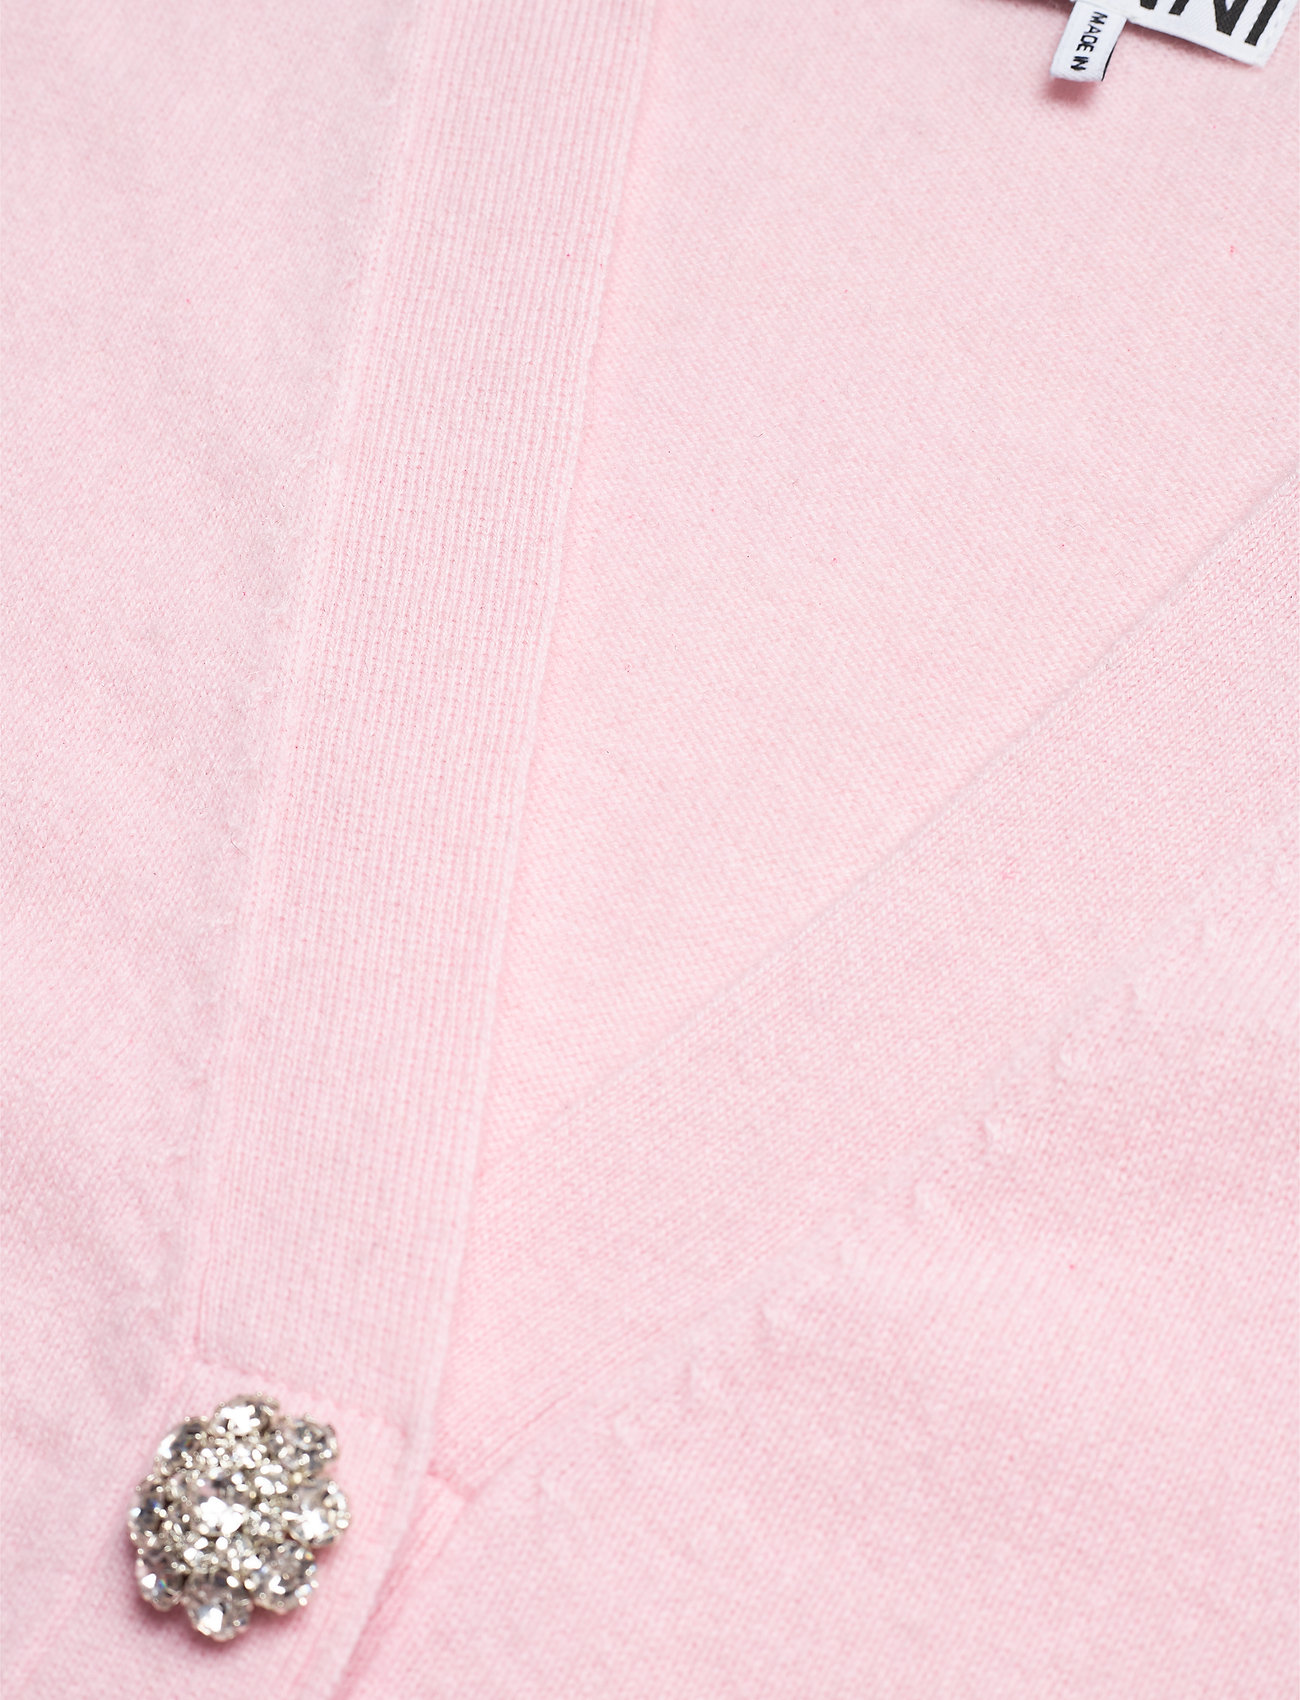 Cashmere Knit (Cherry Blossom) (275 €) - Ganni Ohwe9oJC